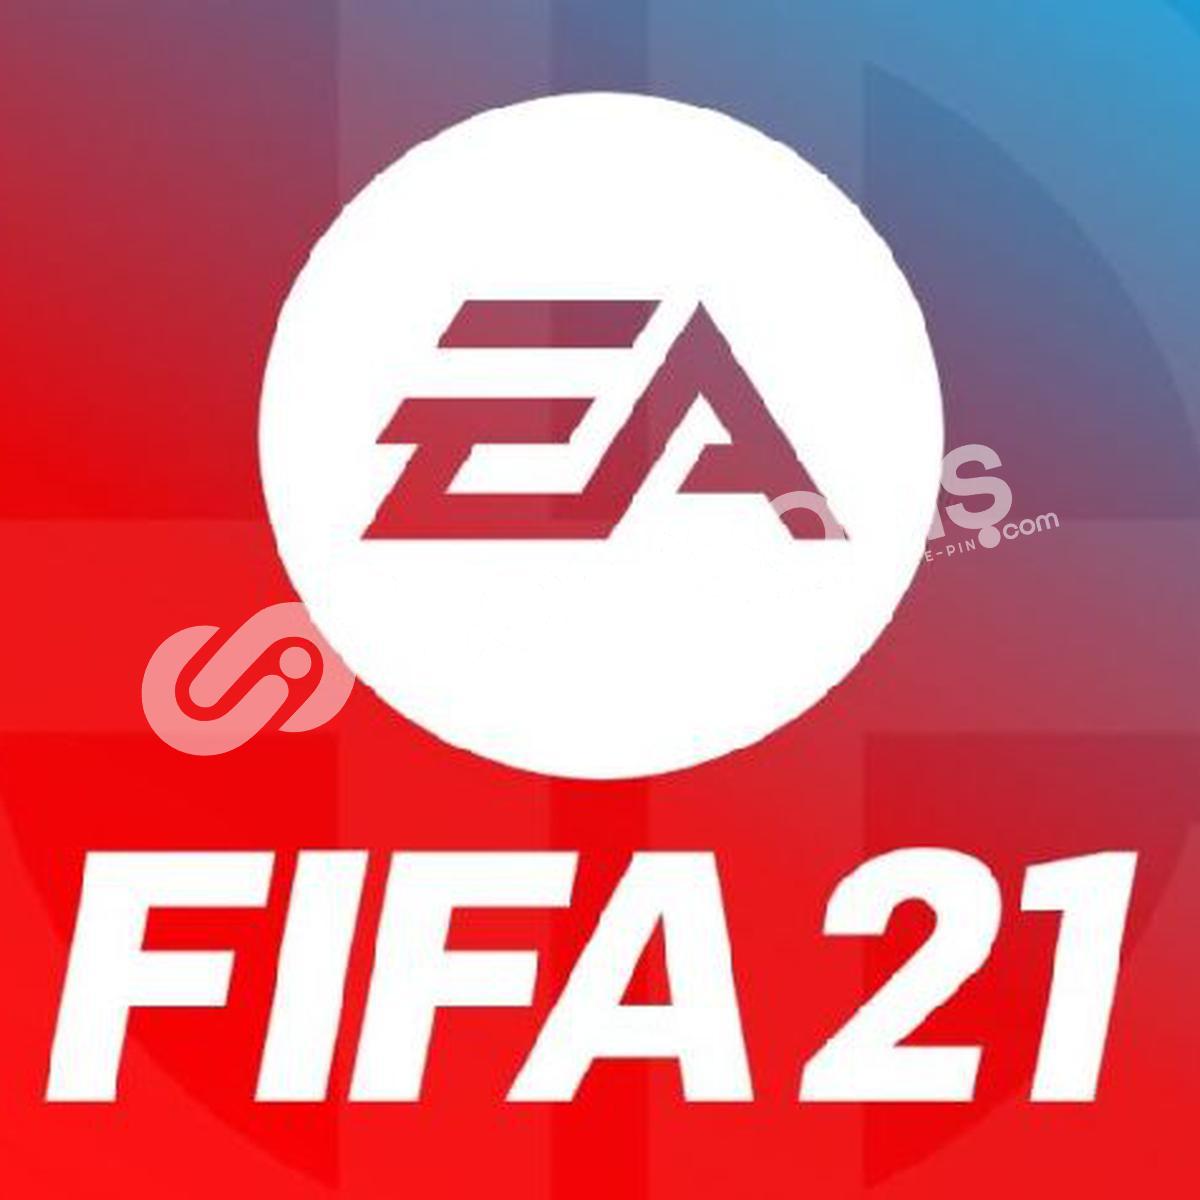 FIFA 2021 4.99tl! (GARANTİLİ)